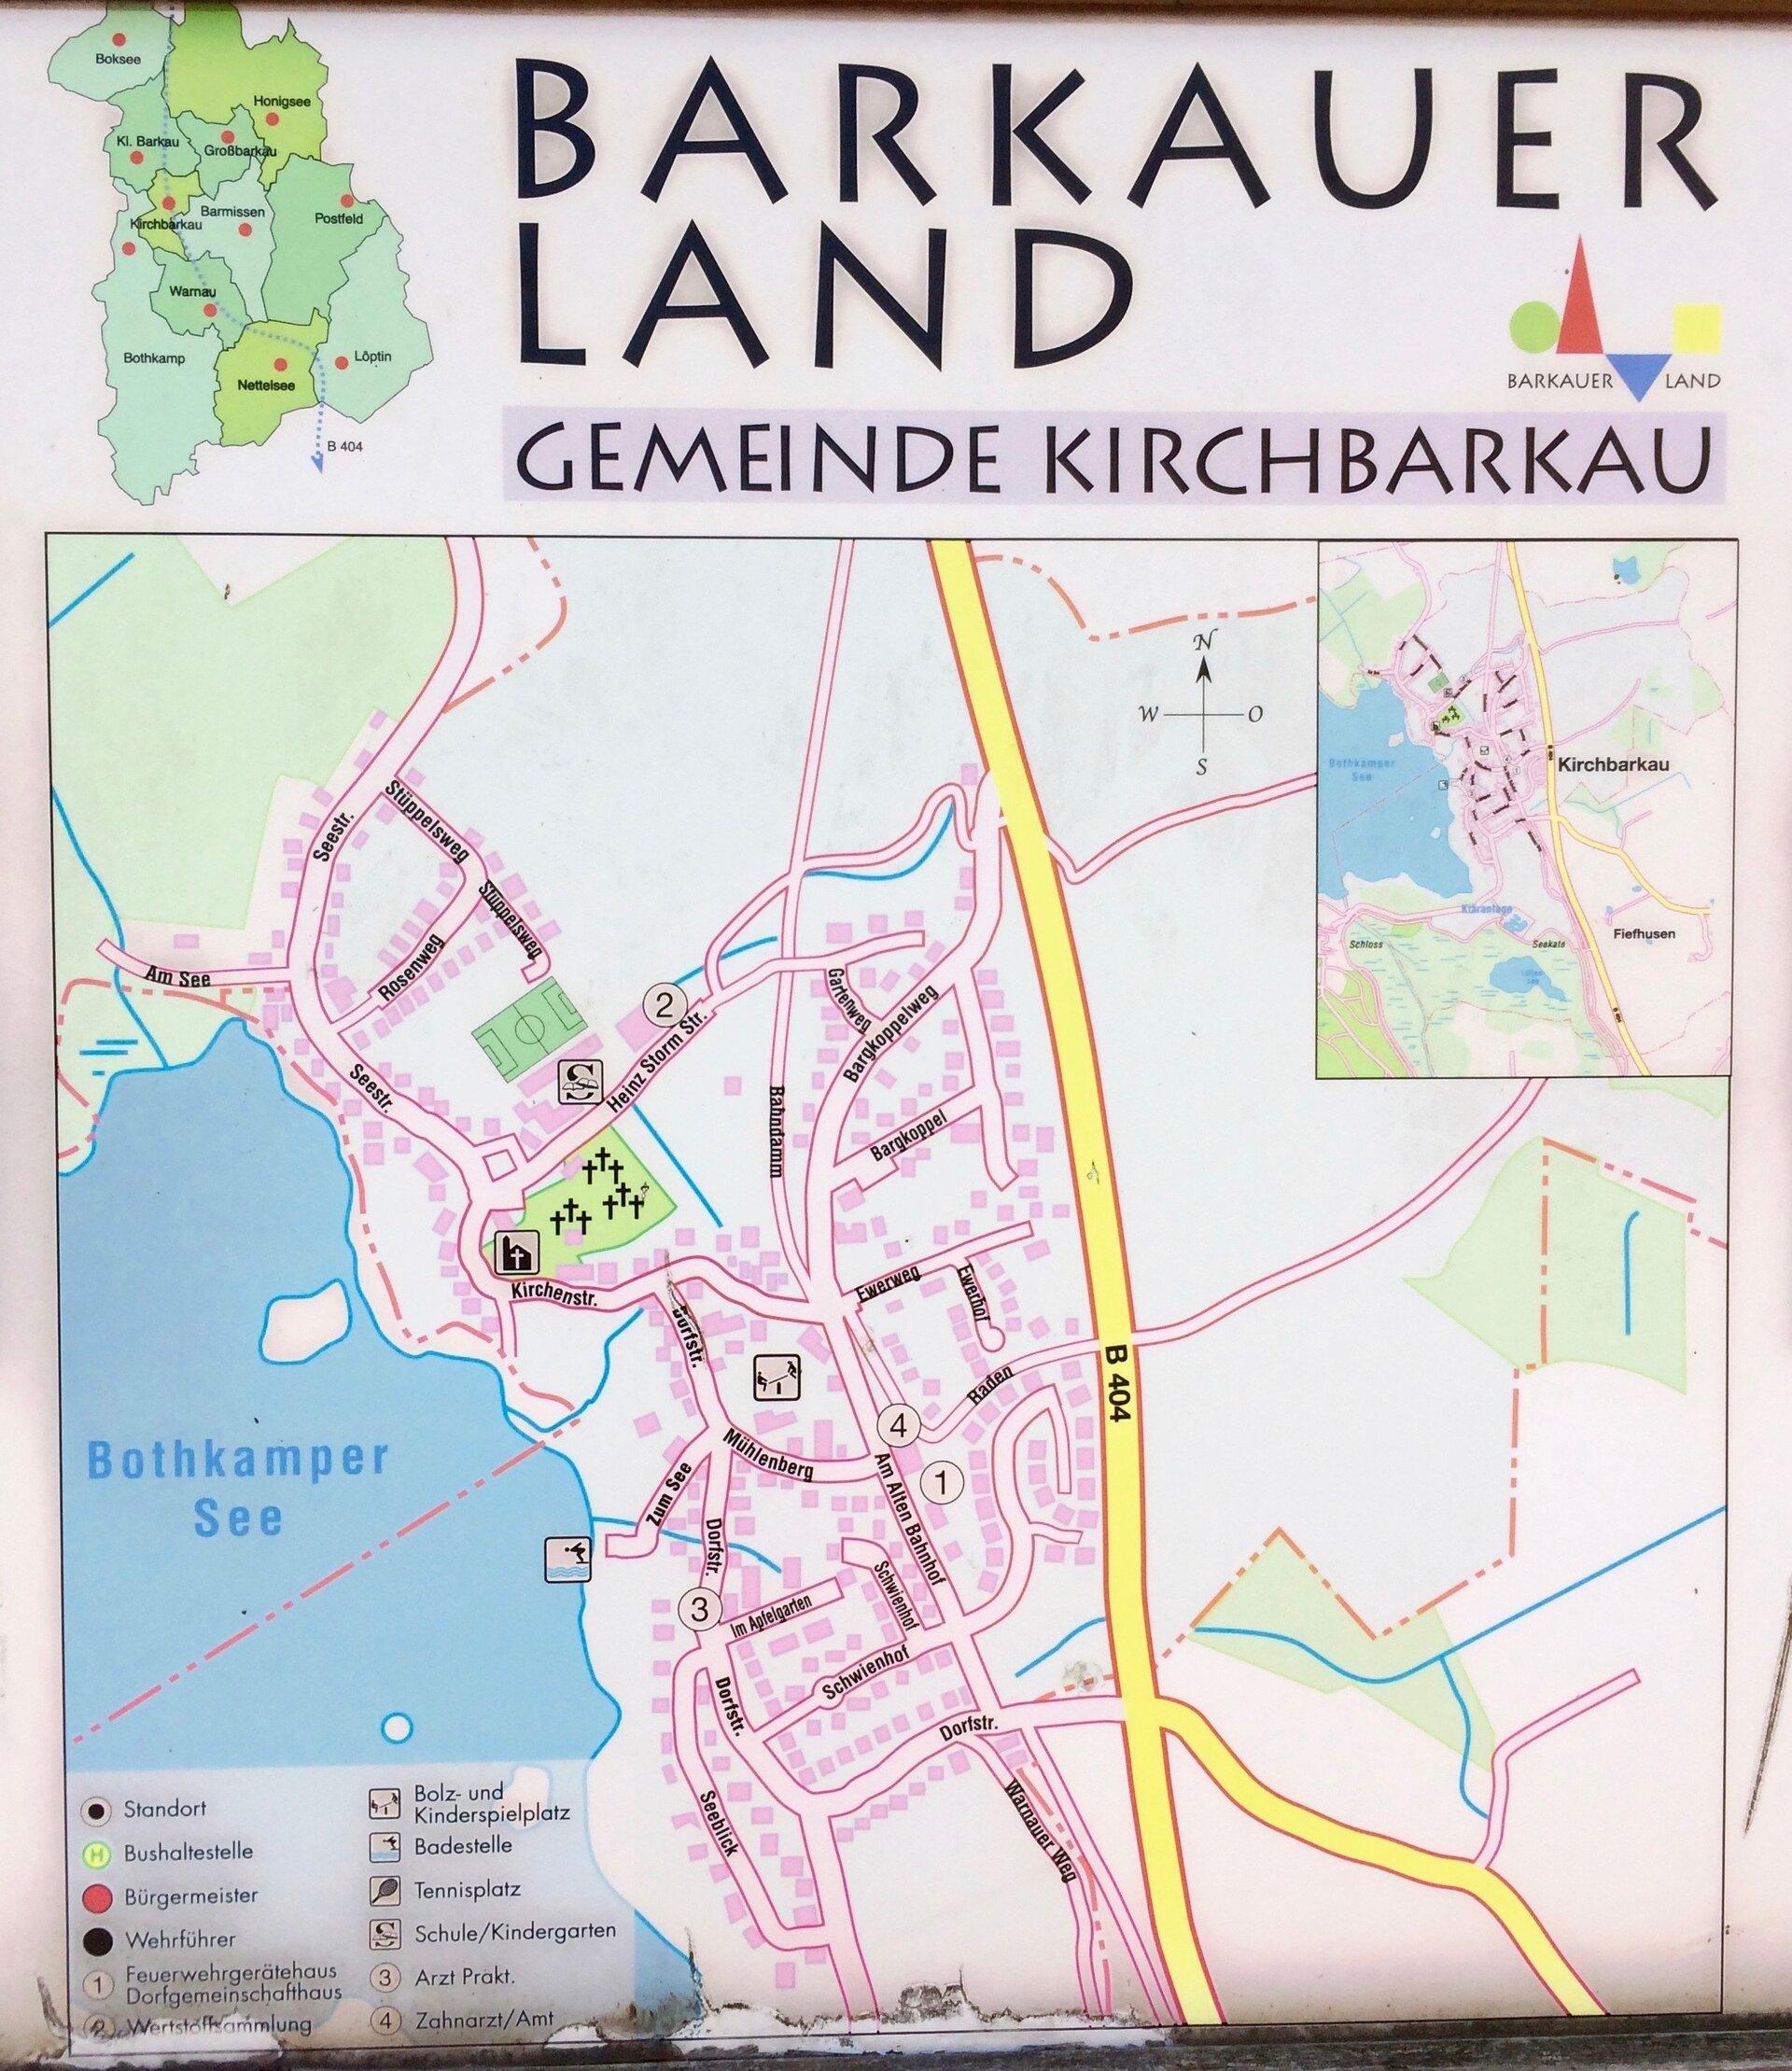 Gemeinde Kirchbarkau